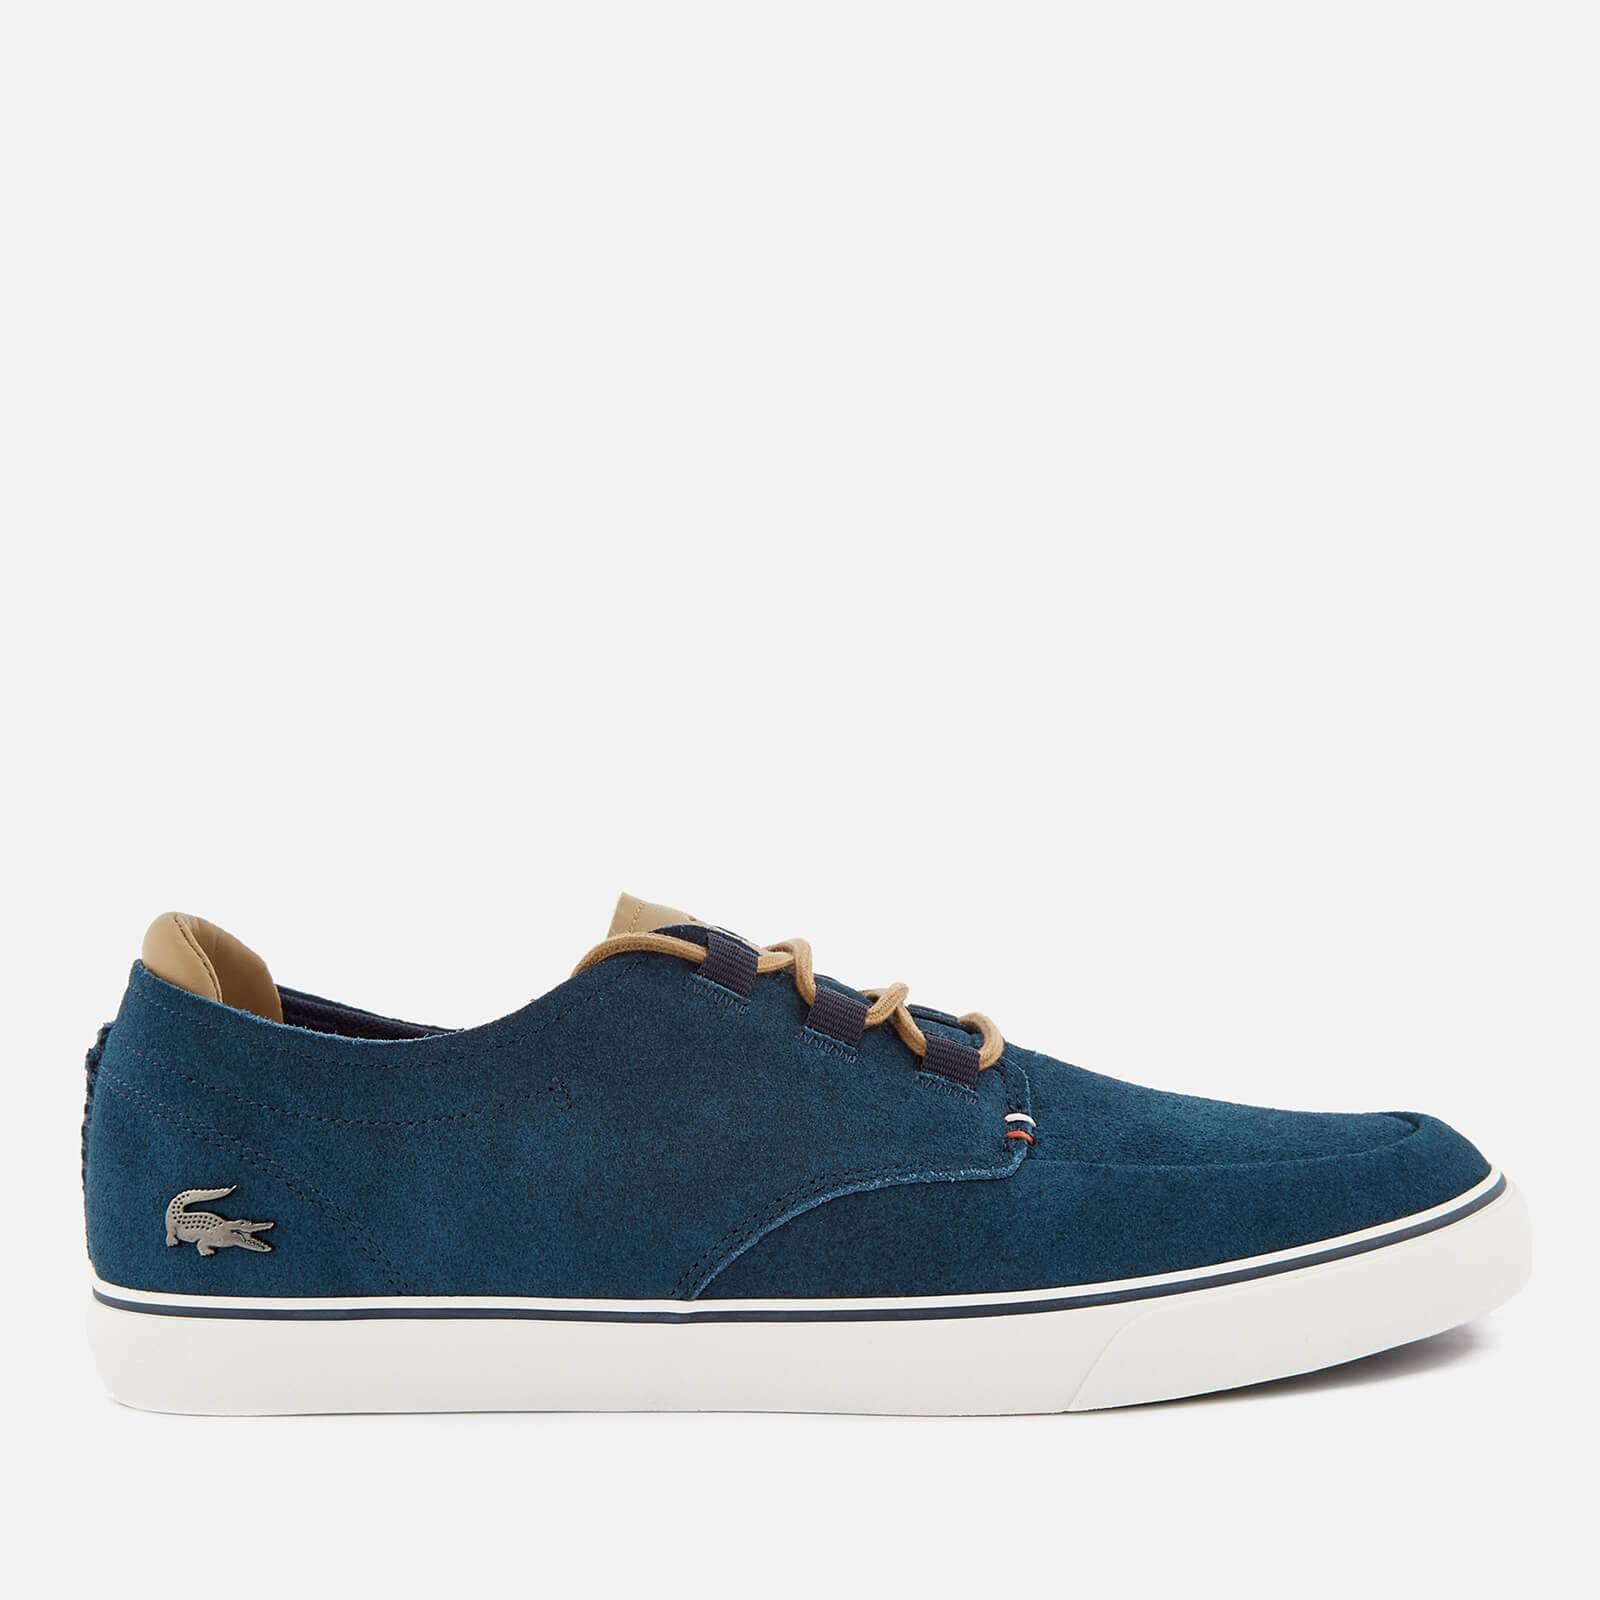 Lacoste Men's Esparre Deck 118 1 Suede Boat Shoes - Navy/Light Brown - UK 11 - Navy